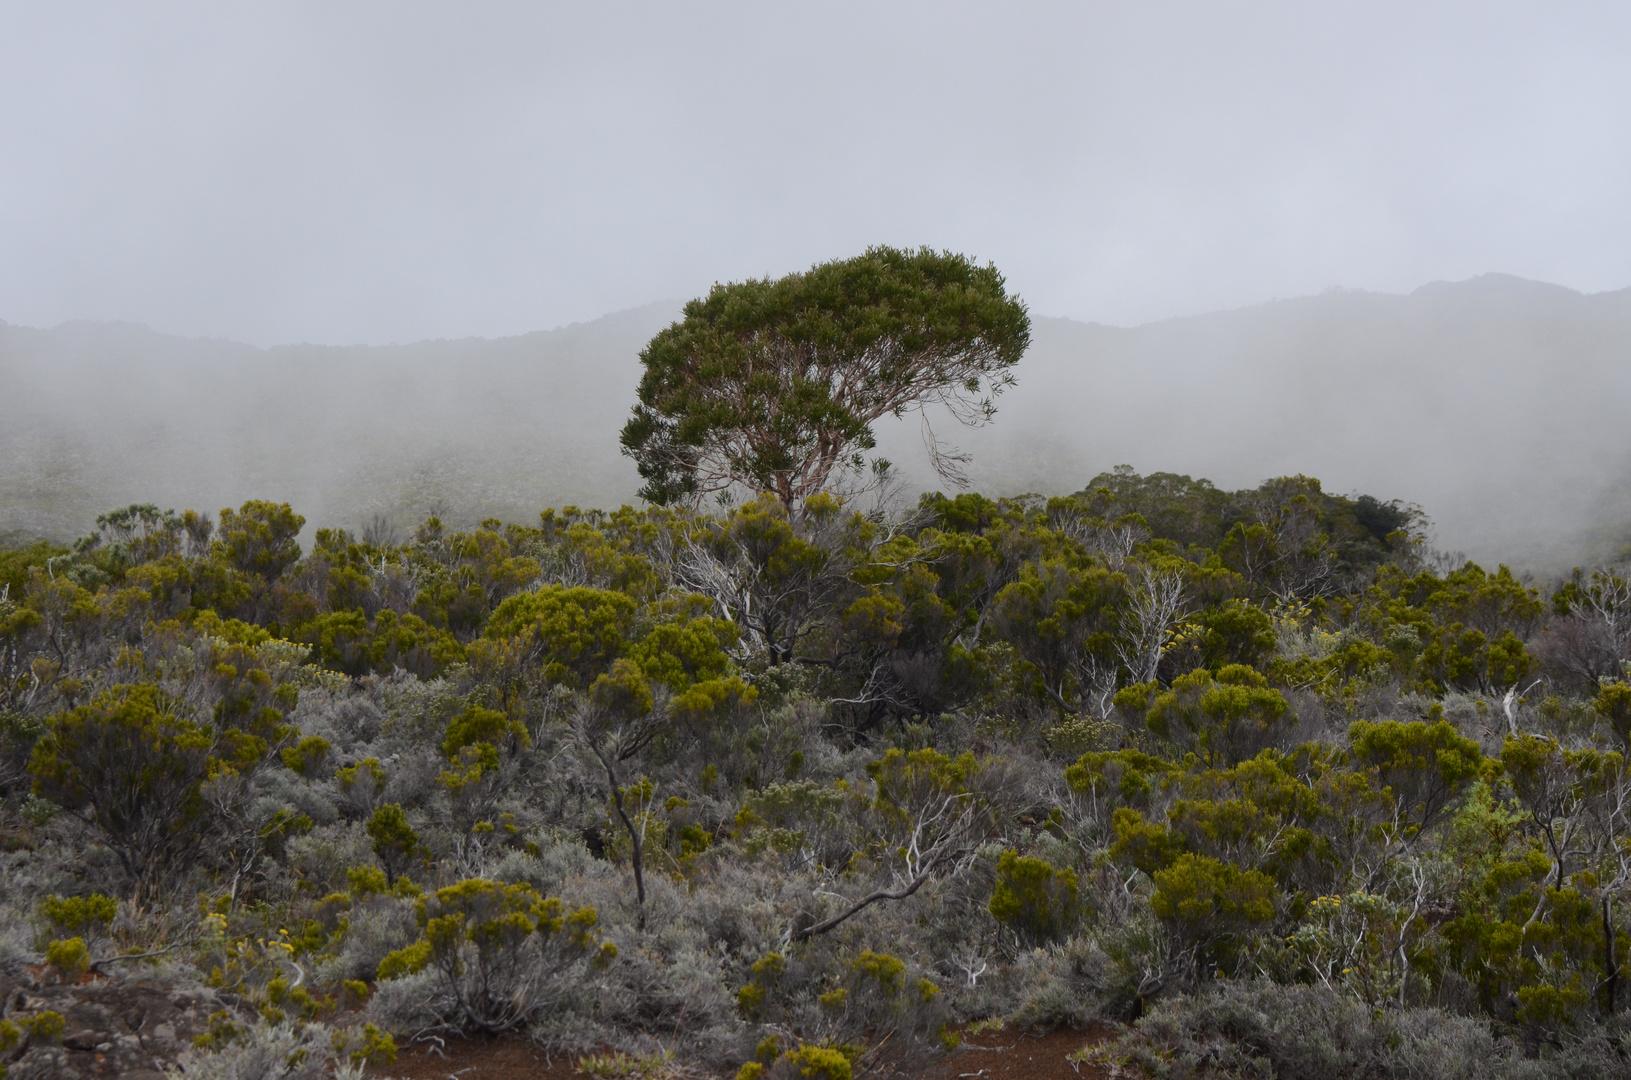 La Réunion - Baum im Hochnebel